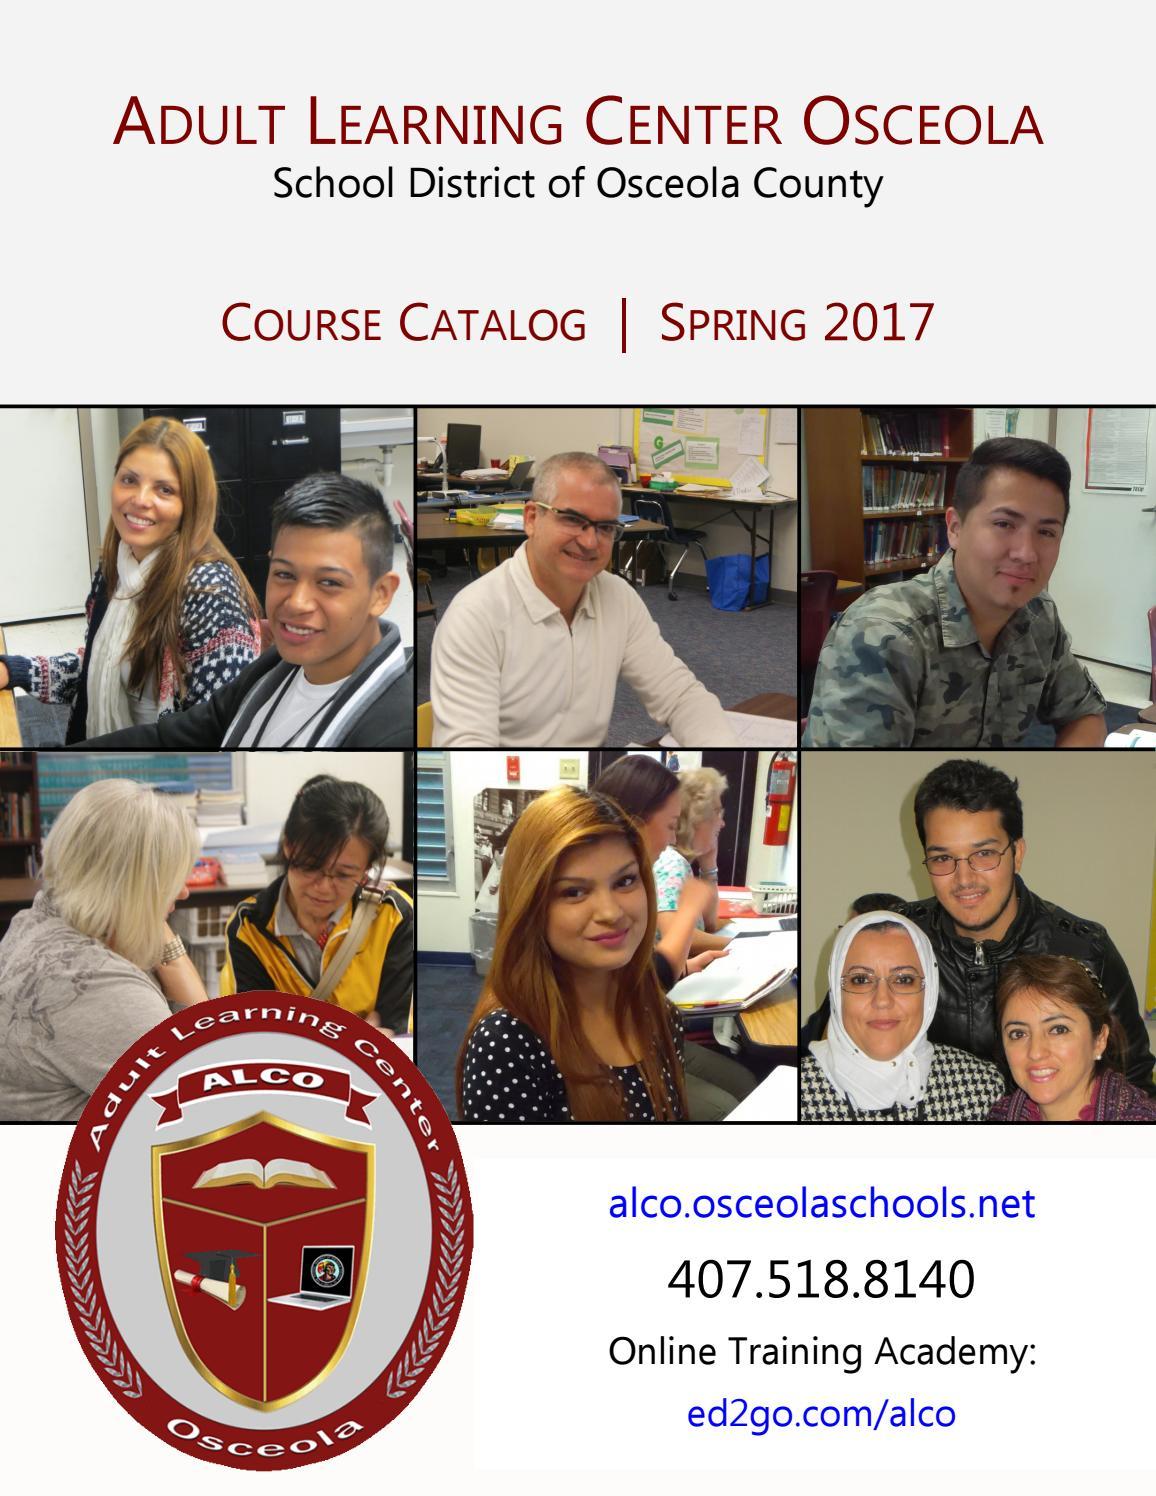 Adult Learning Center Osceola 59